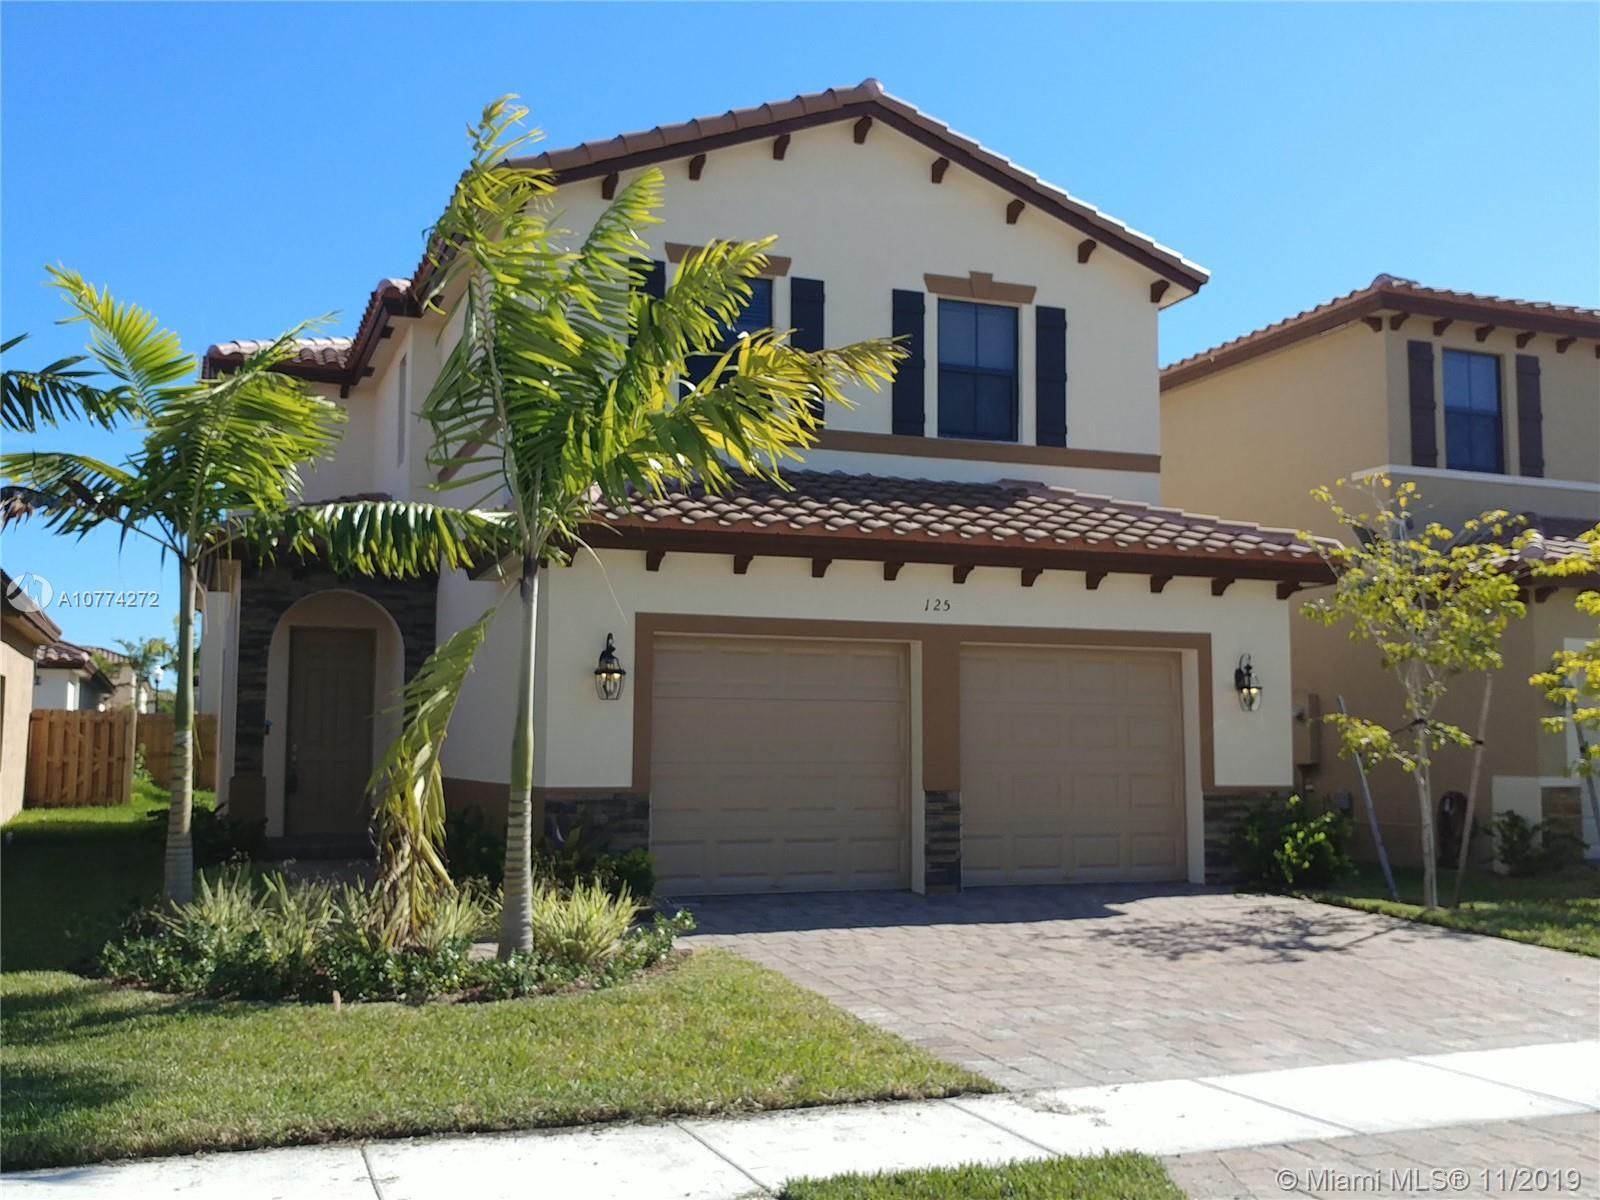 125 NE 24 TE, Homestead, FL 33033 - Homestead, FL real estate listing